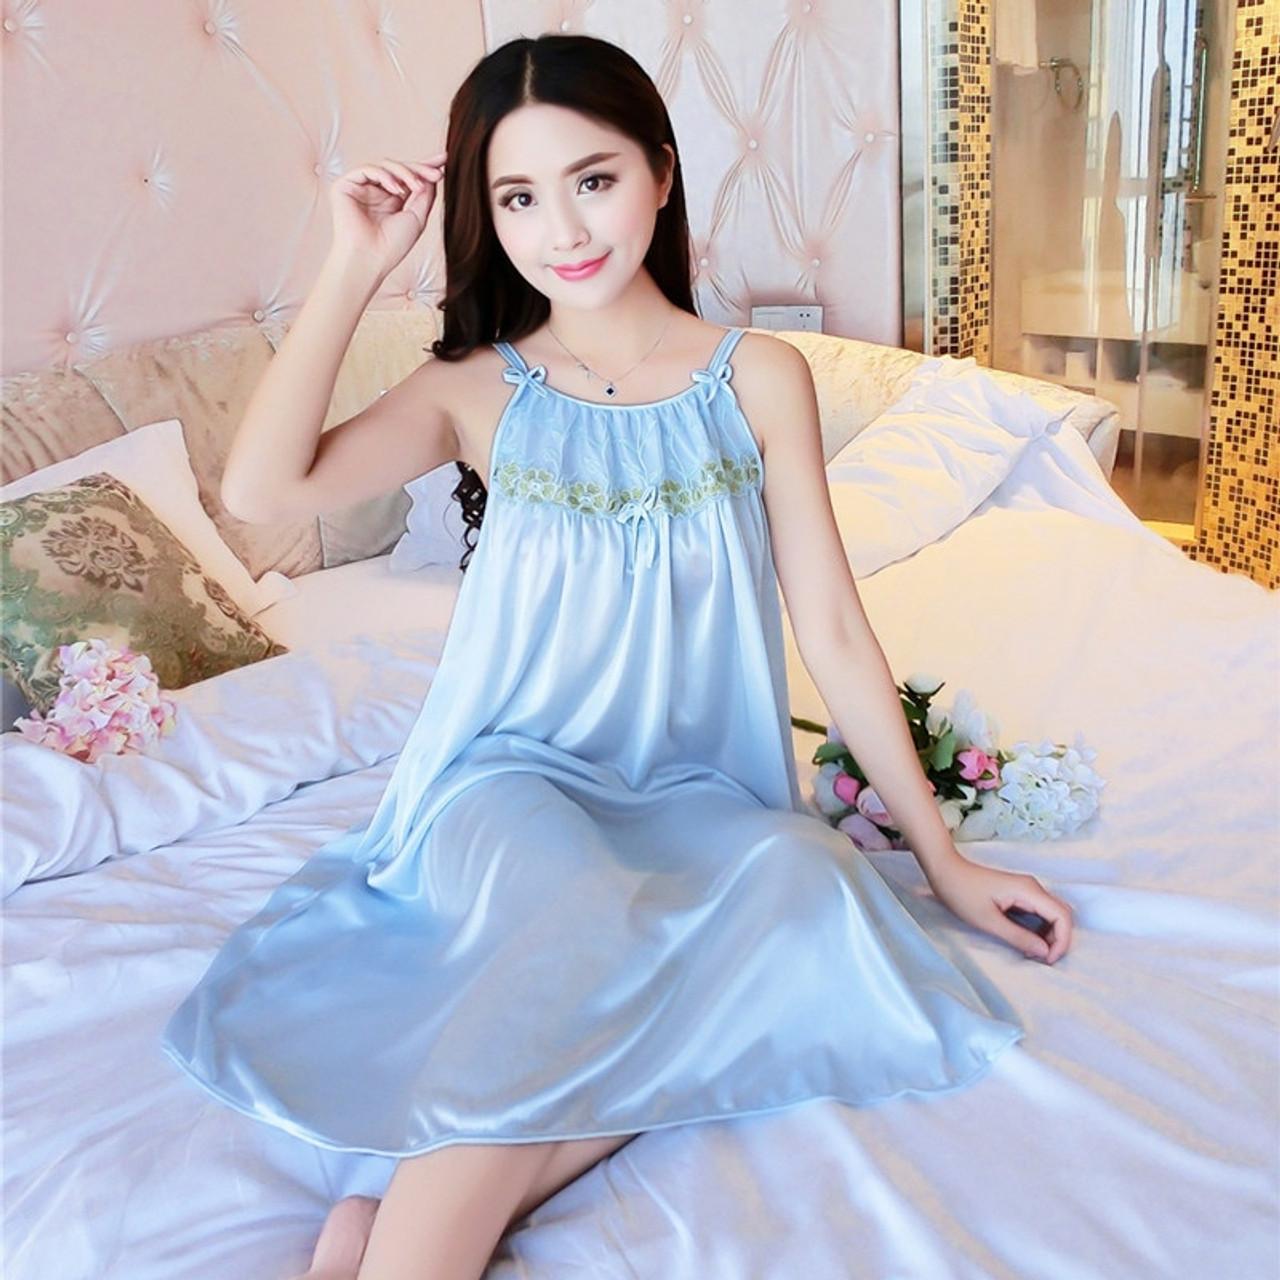 c49927e0c91 ... Fashion Silk Brand Spring Summer Silk Nightgown Women Sexy Spaghetti  Strap Lace Lingerie Dress Sleepwear Sleepshirts ...